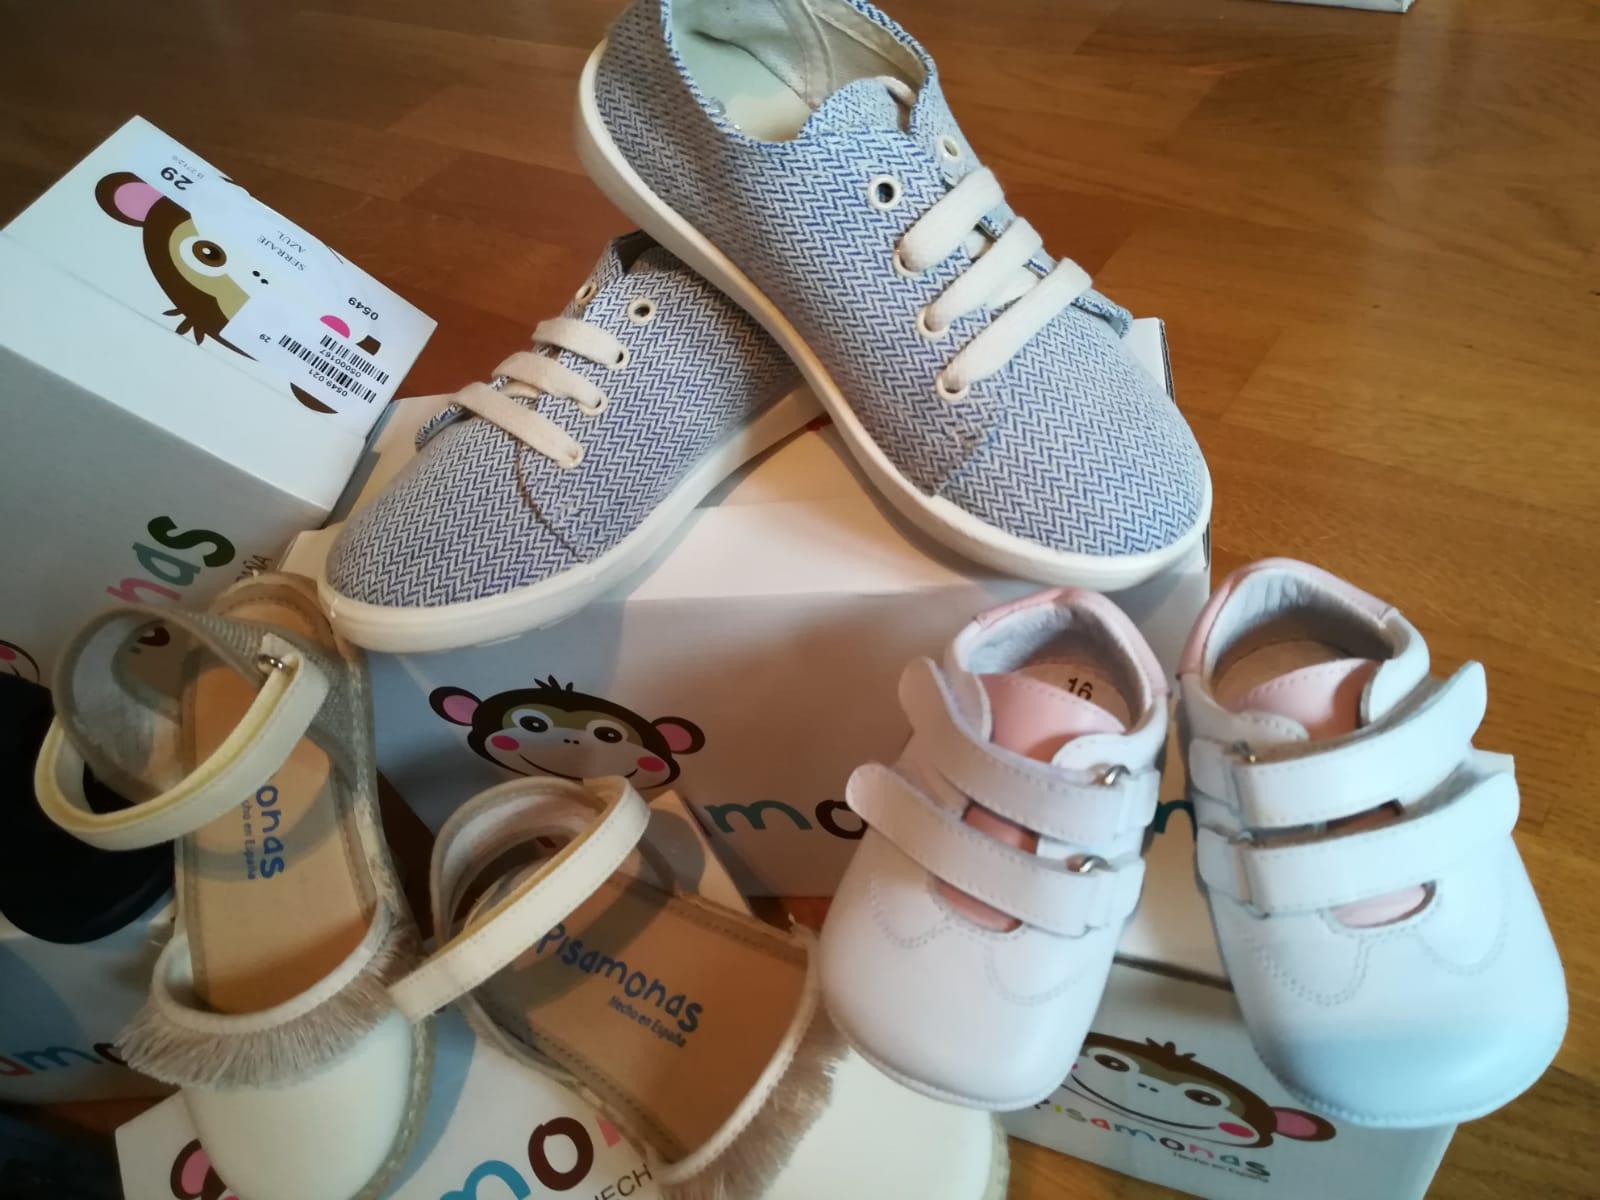 calzado infantil - Novedades en calzado infantil Pisamonas primavera-verano 2018